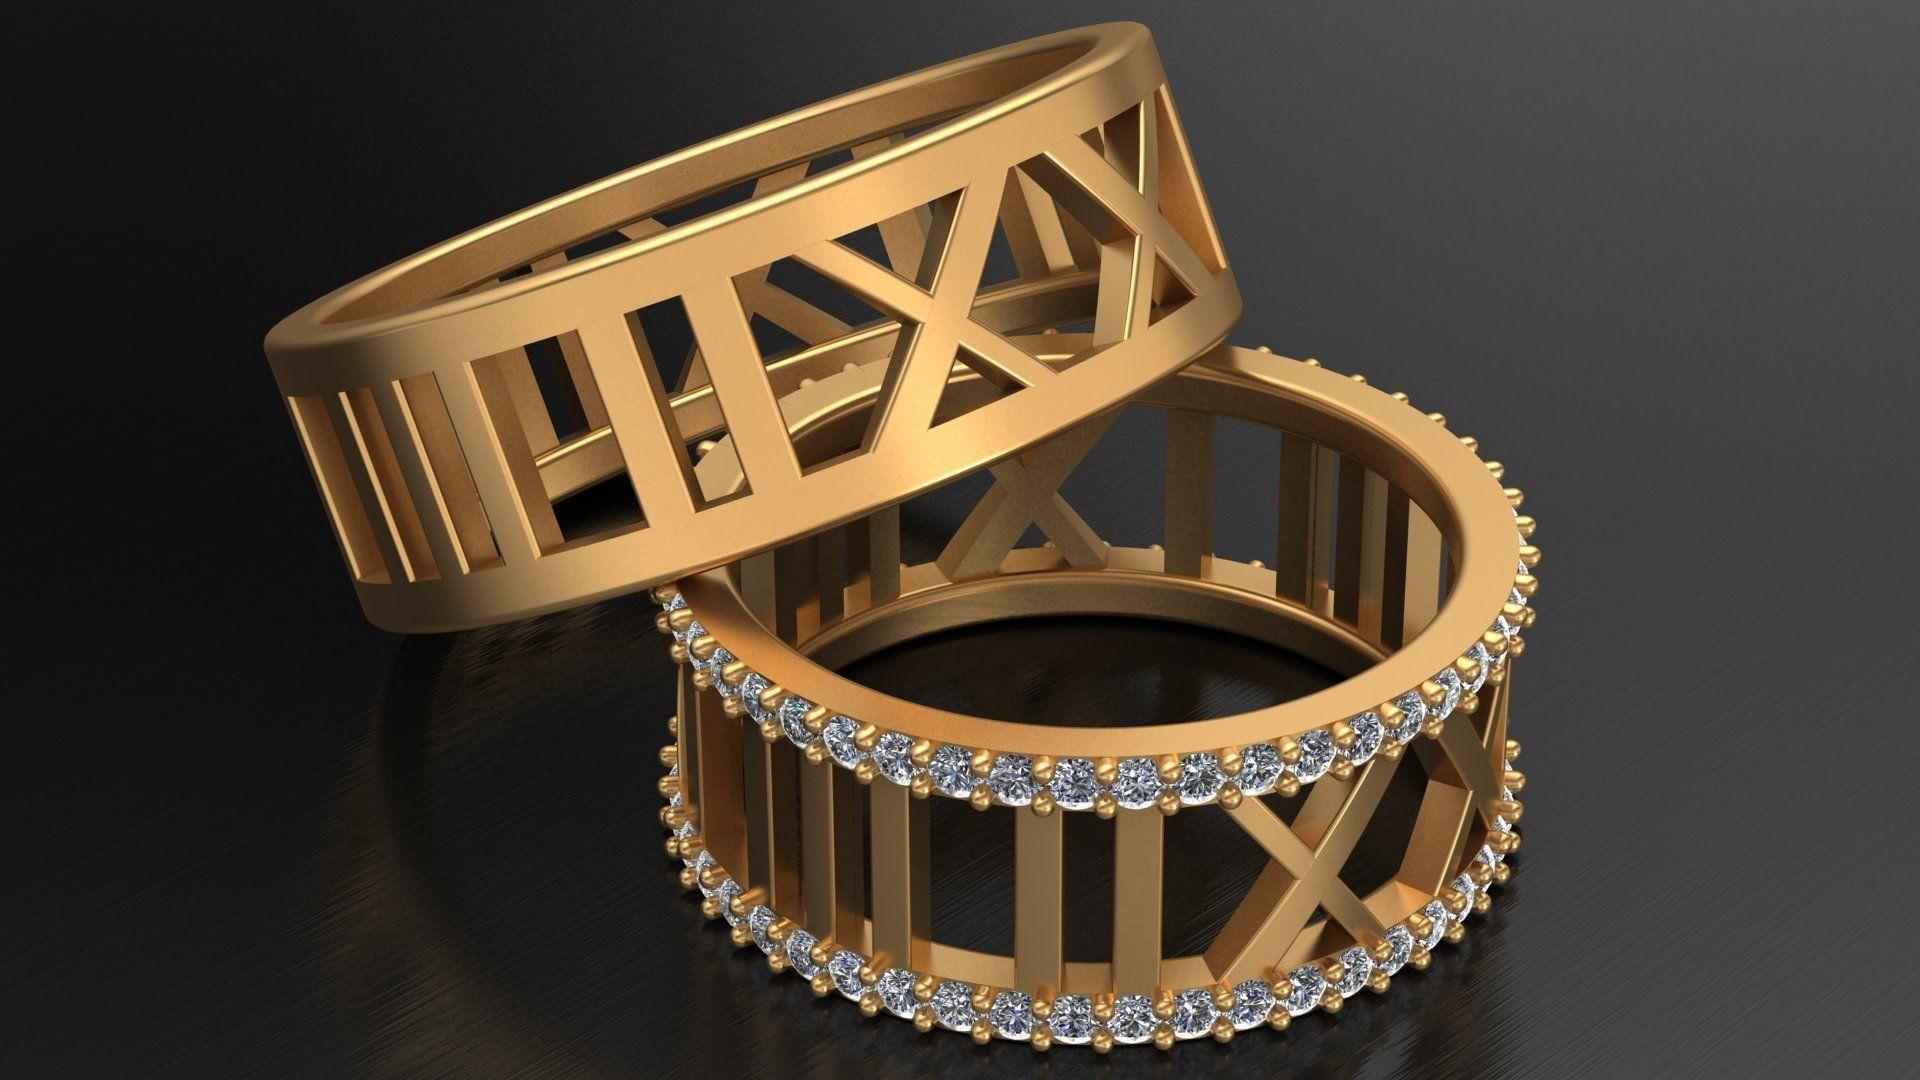 TIFFANY ATLAS WEDDING DIAMOND RINGS